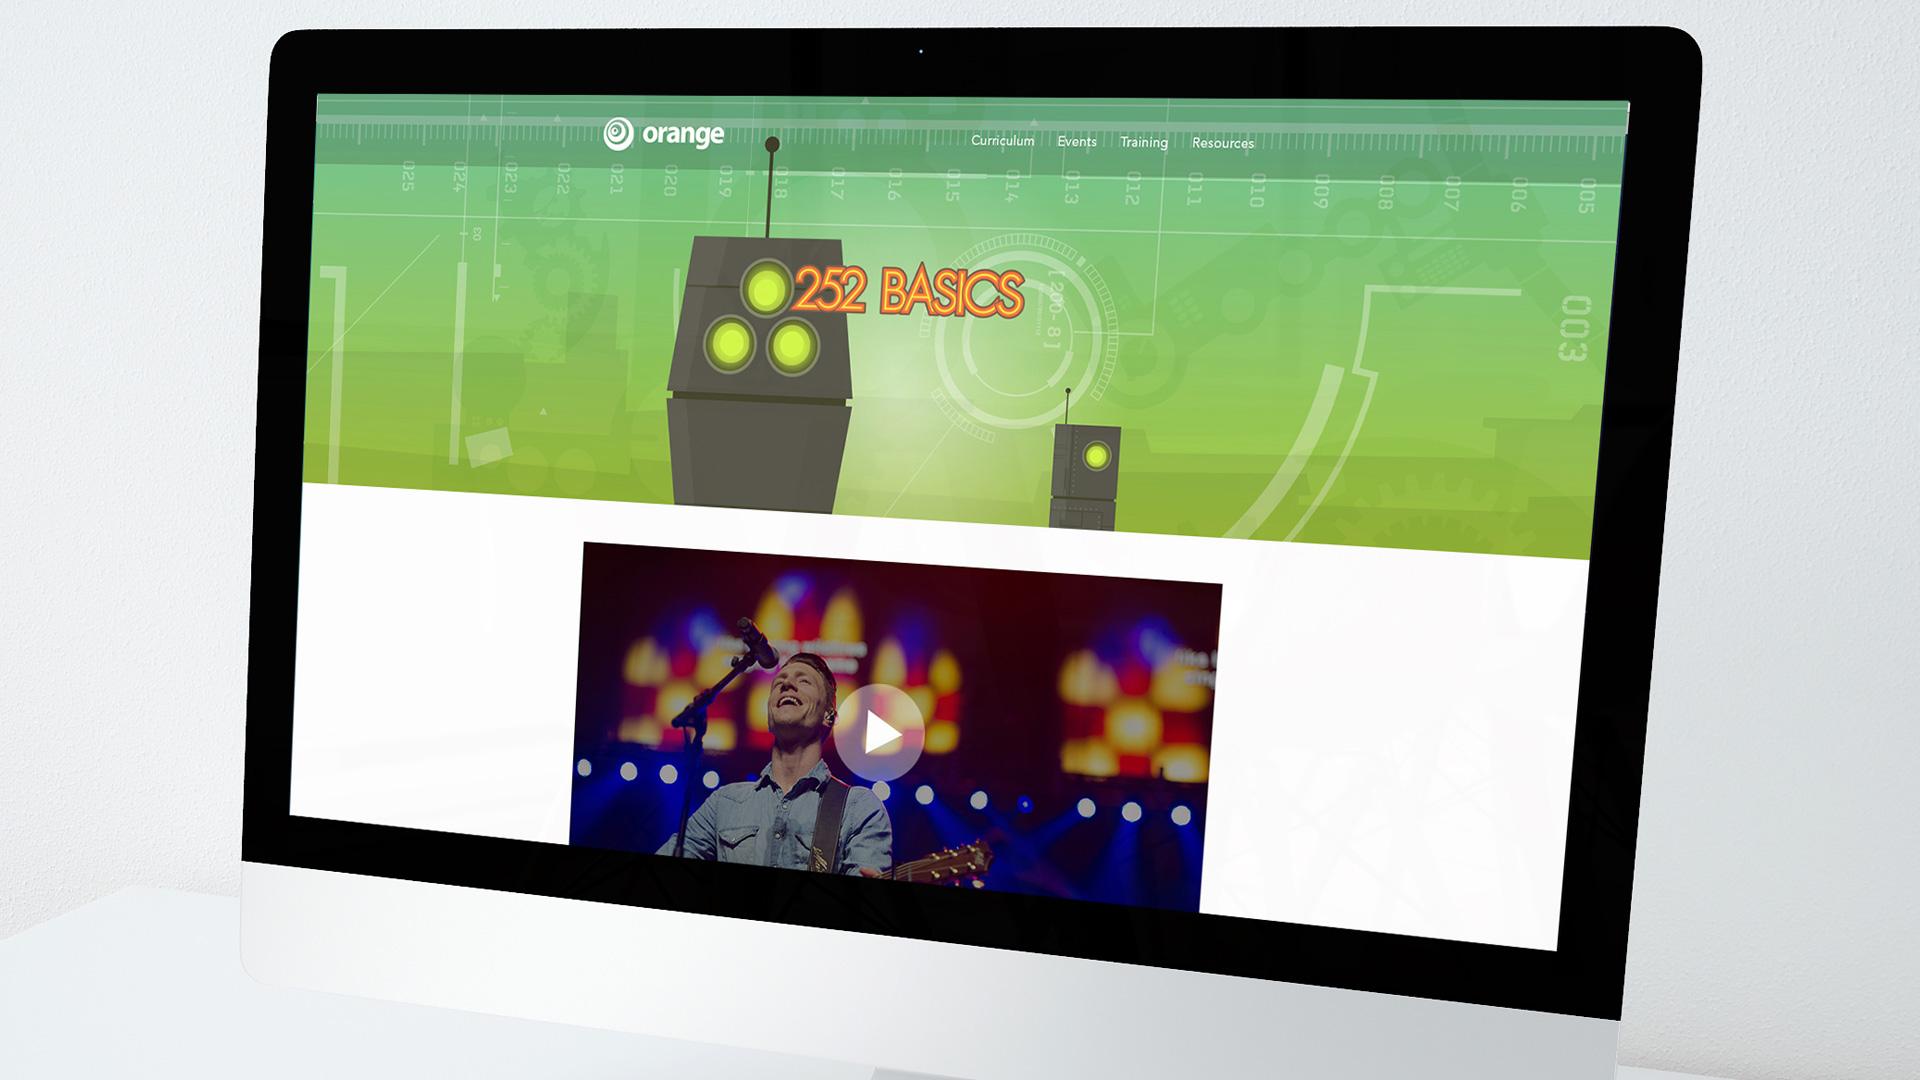 orangebrand-252basicswebsite.jpg